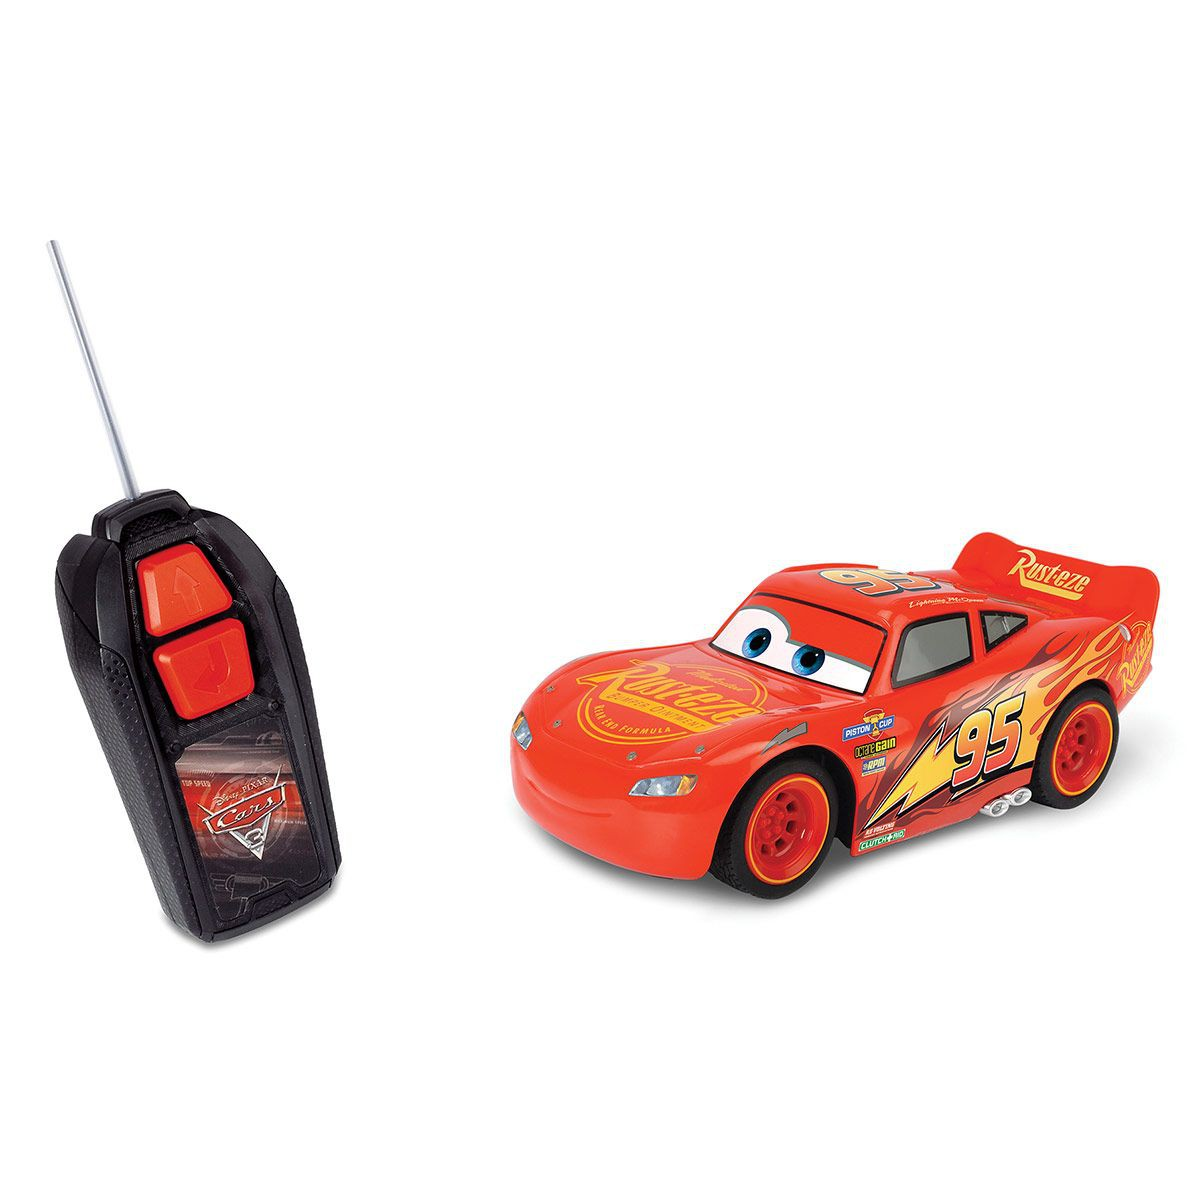 cars telecommandee